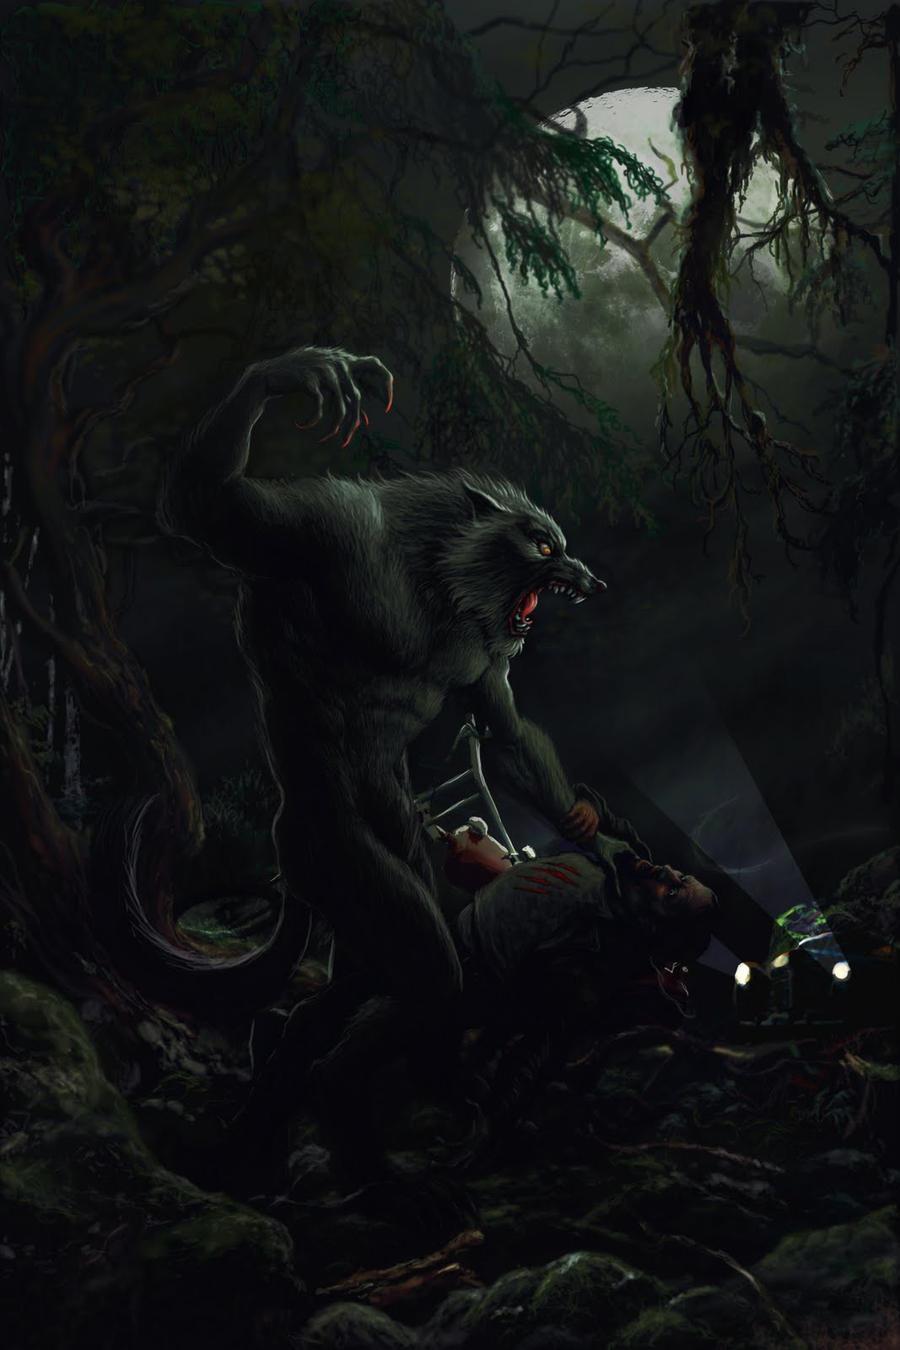 werewolf by ptrepan